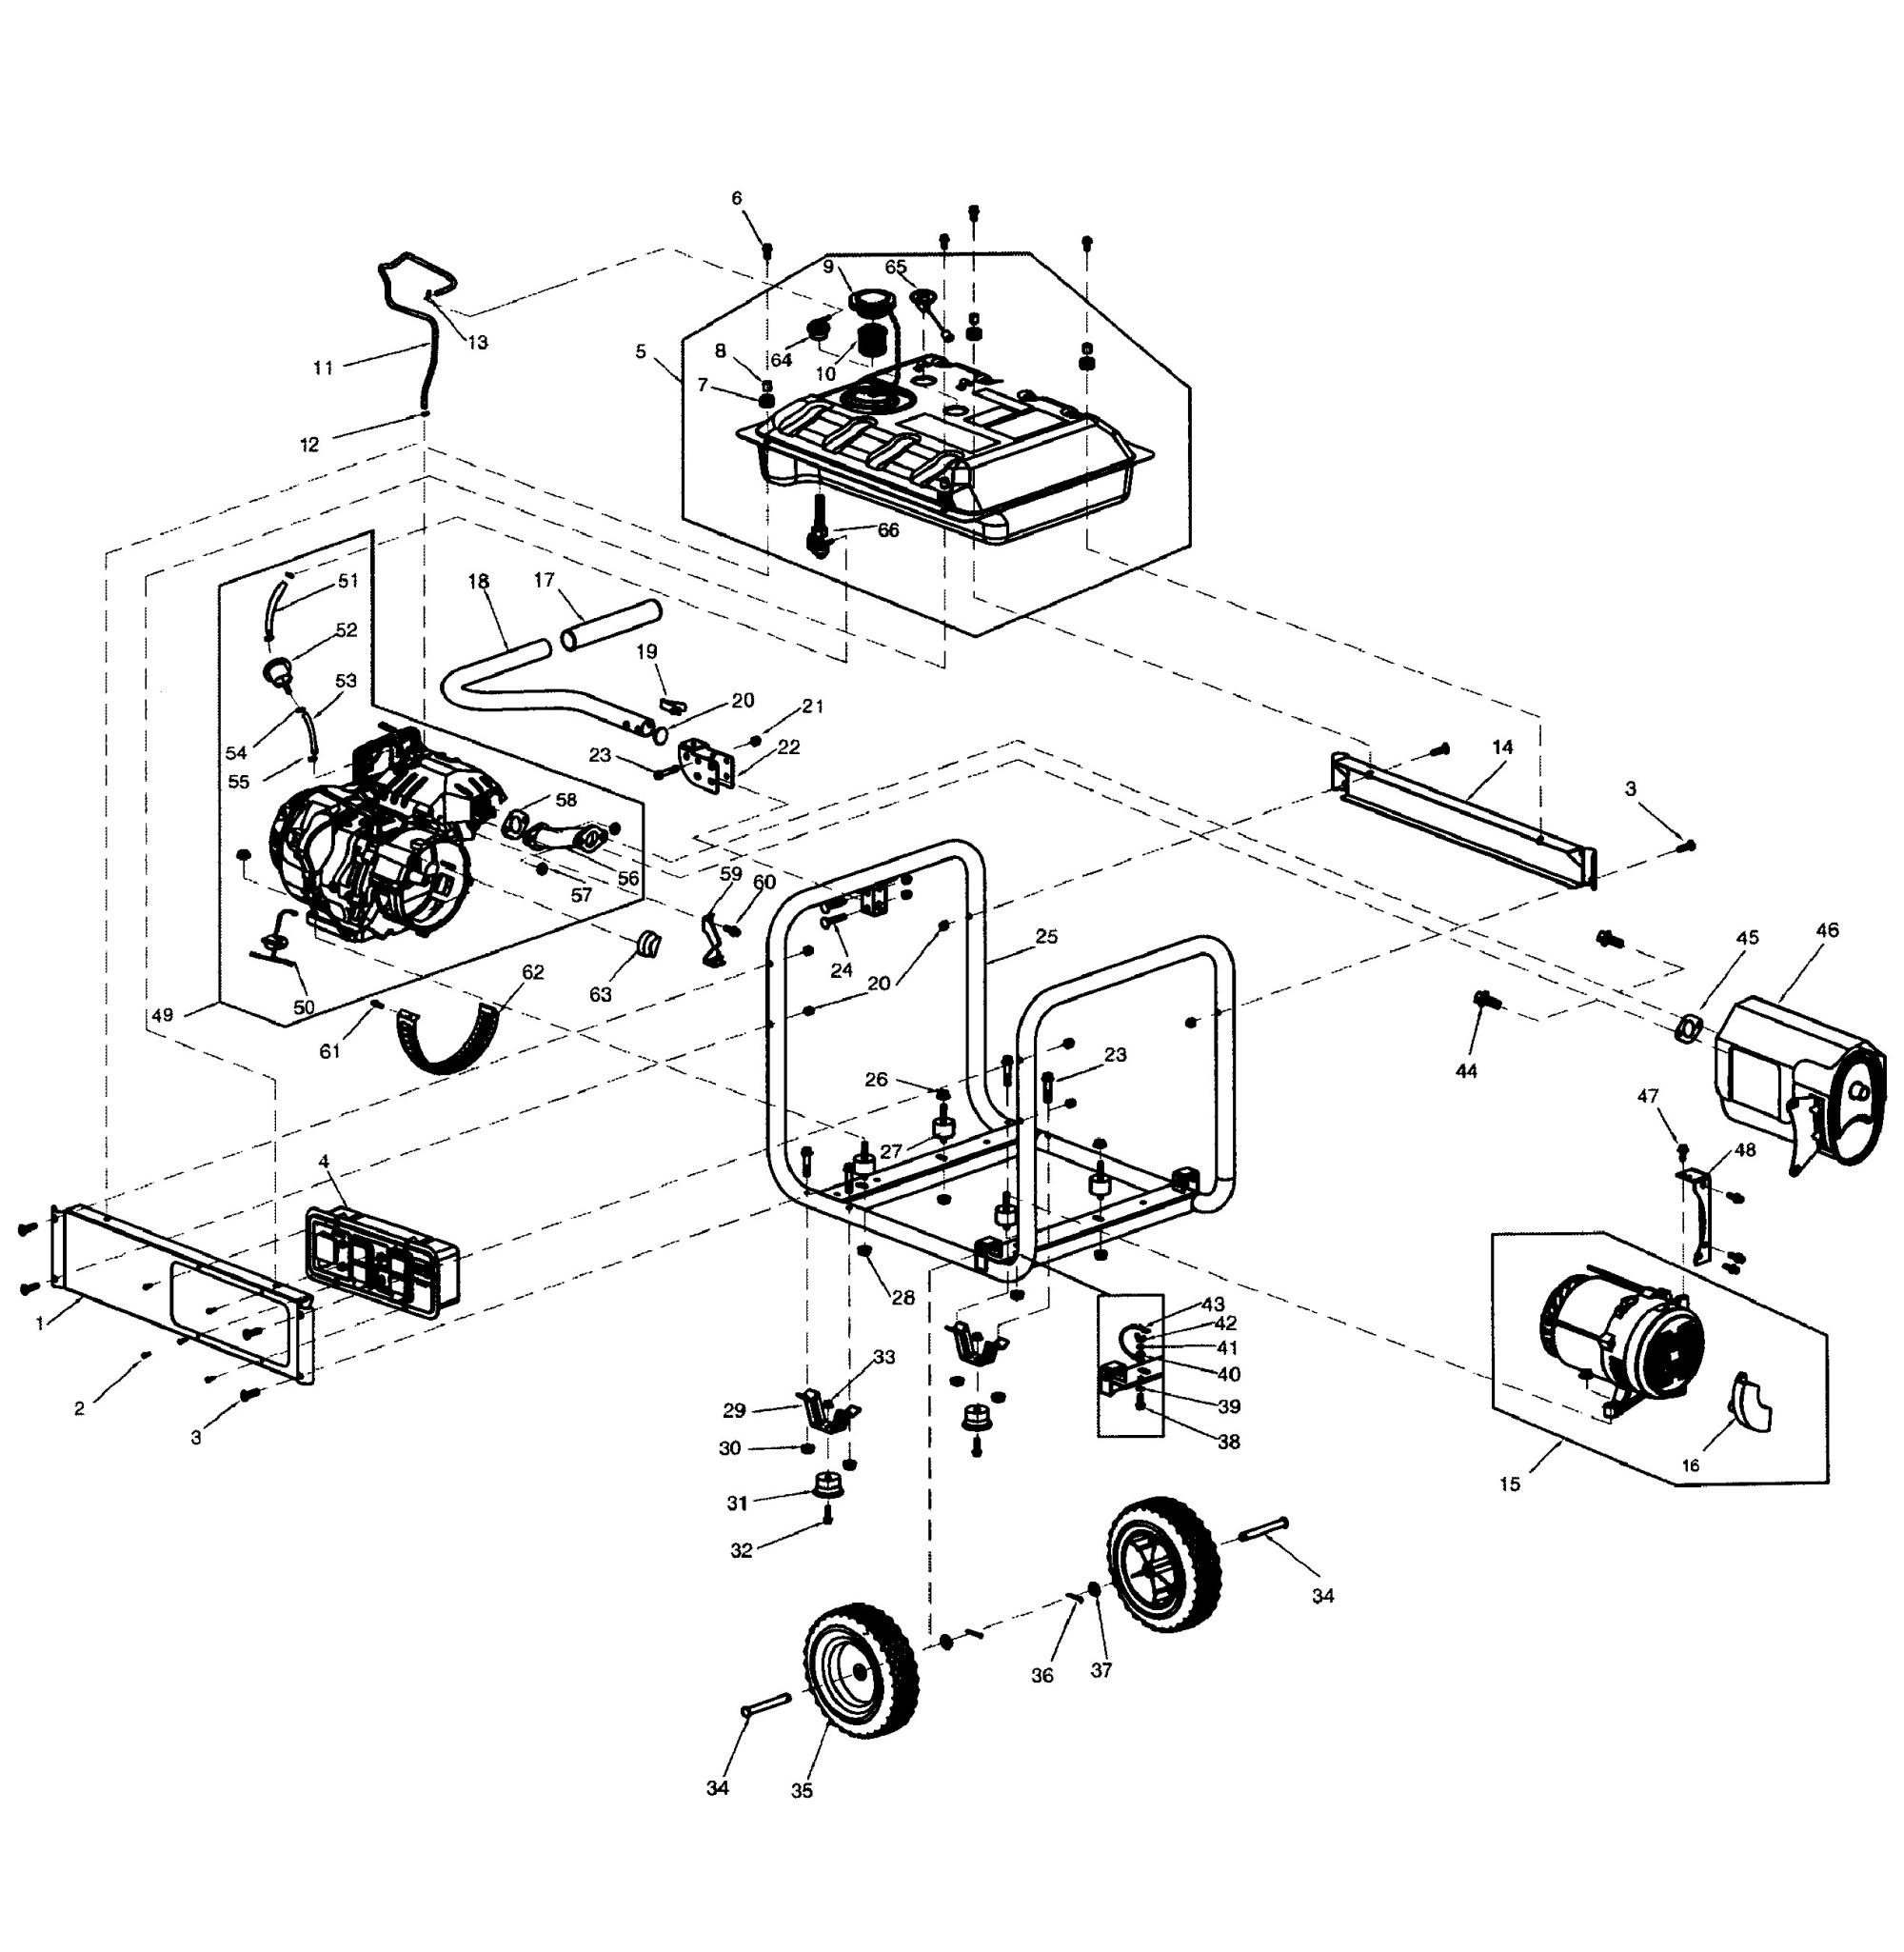 hight resolution of bmw 318 engine diagram wiring diagram tutorial 318 engine component diagram